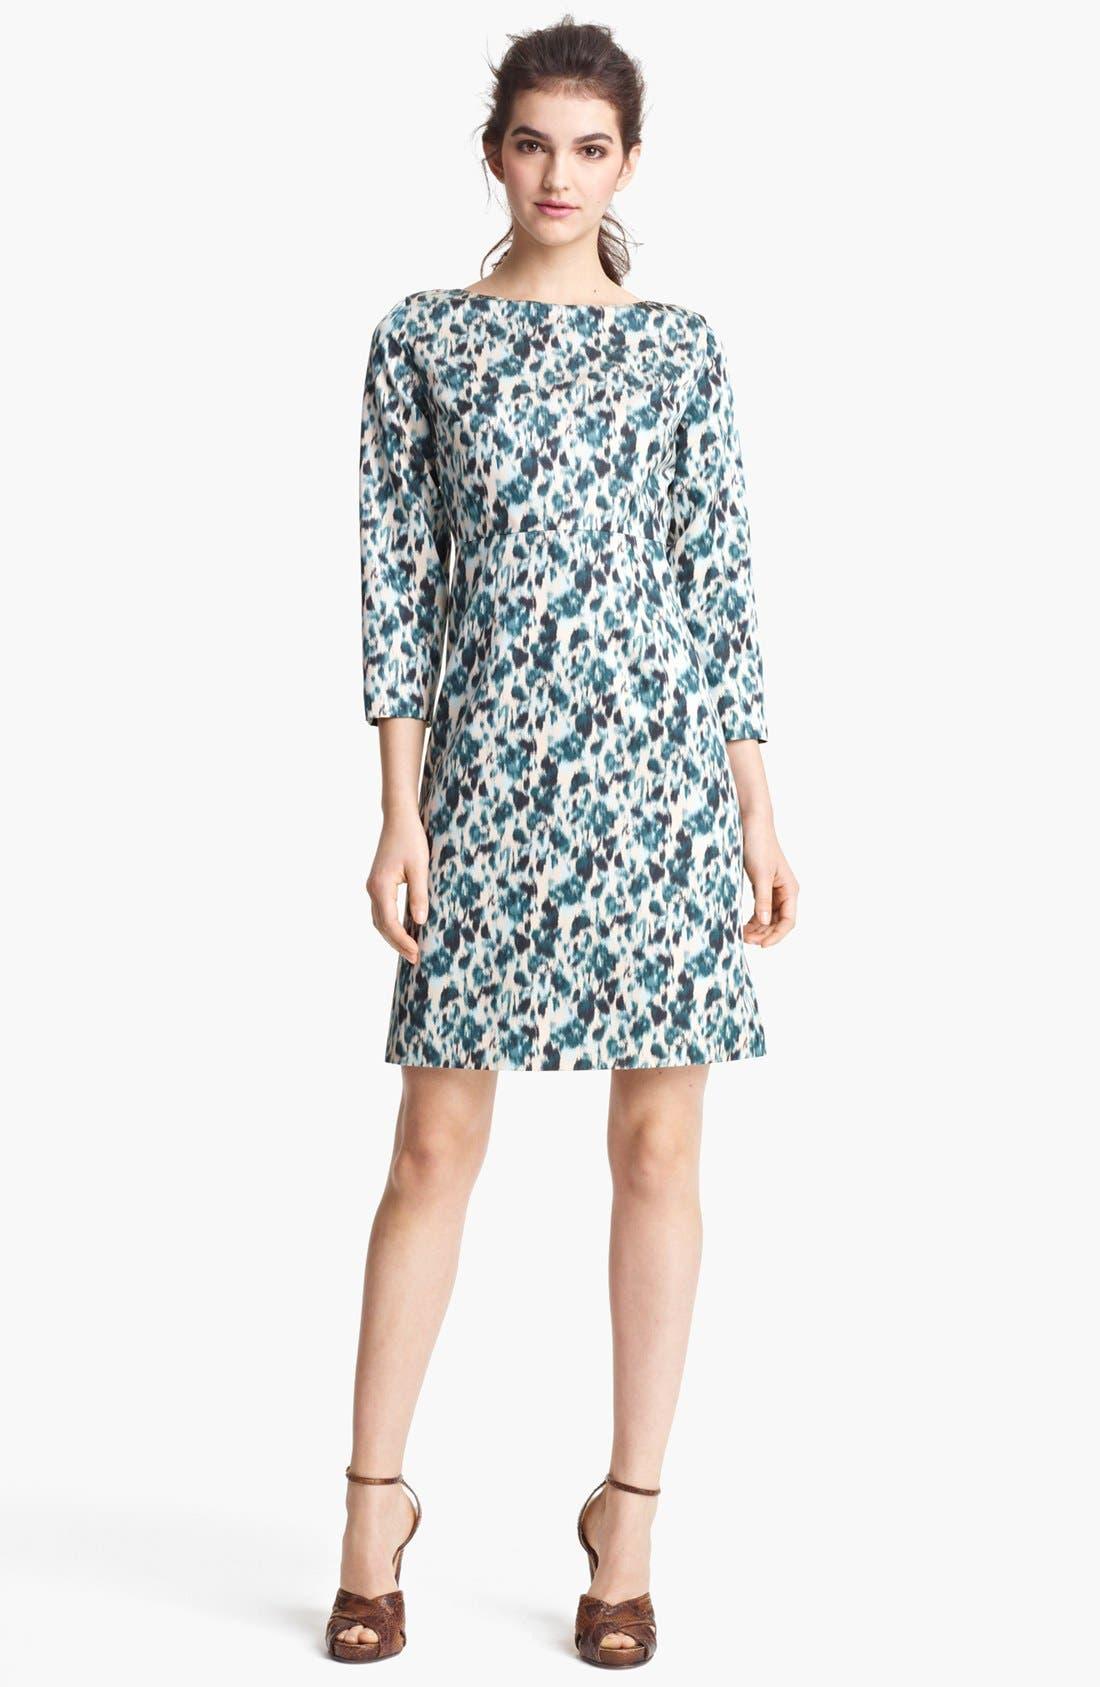 Main Image - MARC JACOBS Floral Print Dress